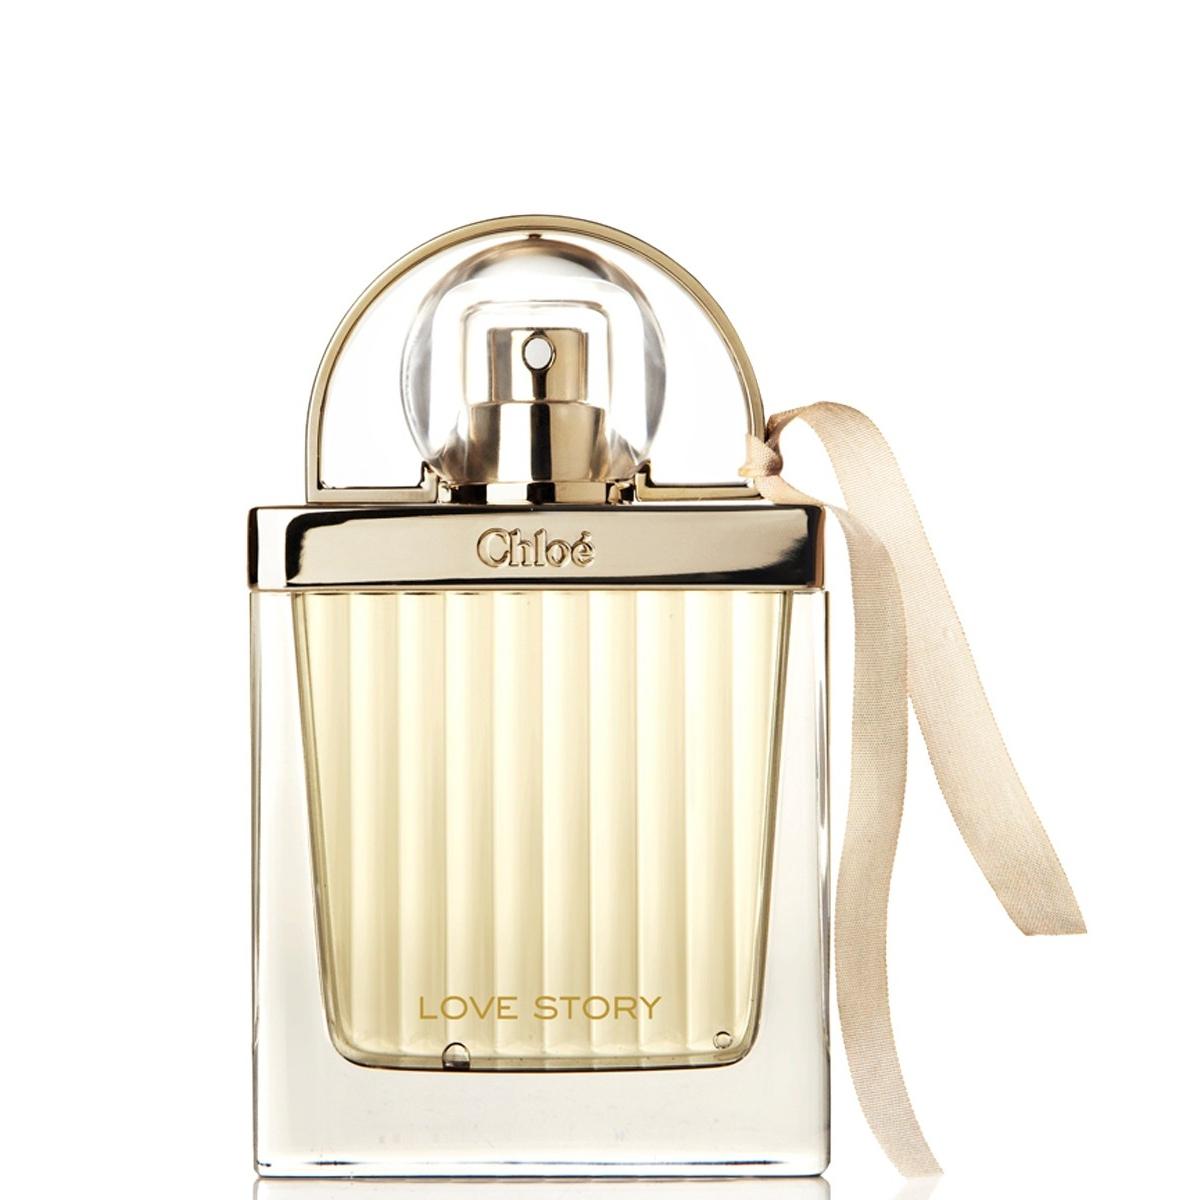 Chlo Love Story eau de parfum spray donna 50 ml